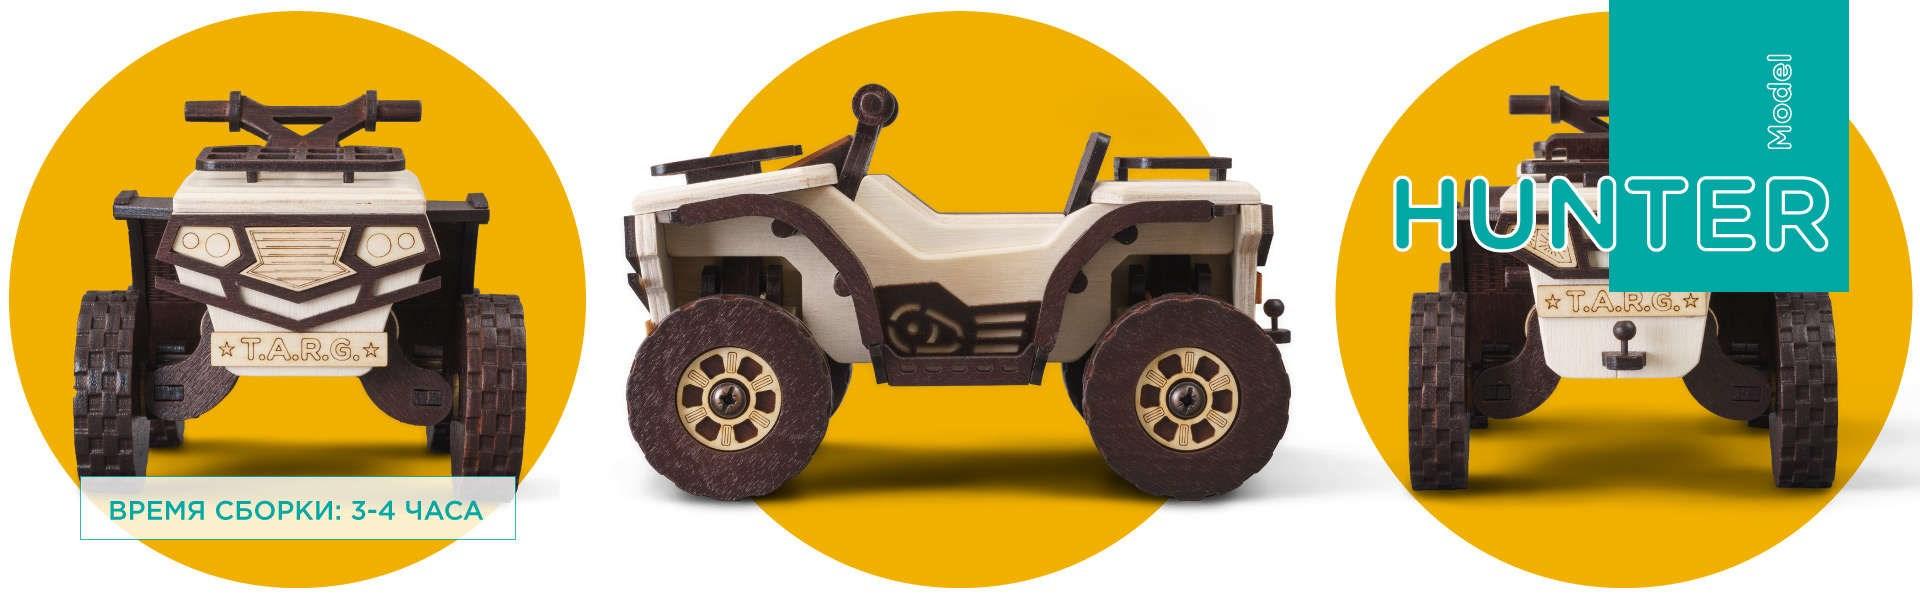 Сборная модель T.A.R.G. Hunter. Квадроцикл - фото 4979